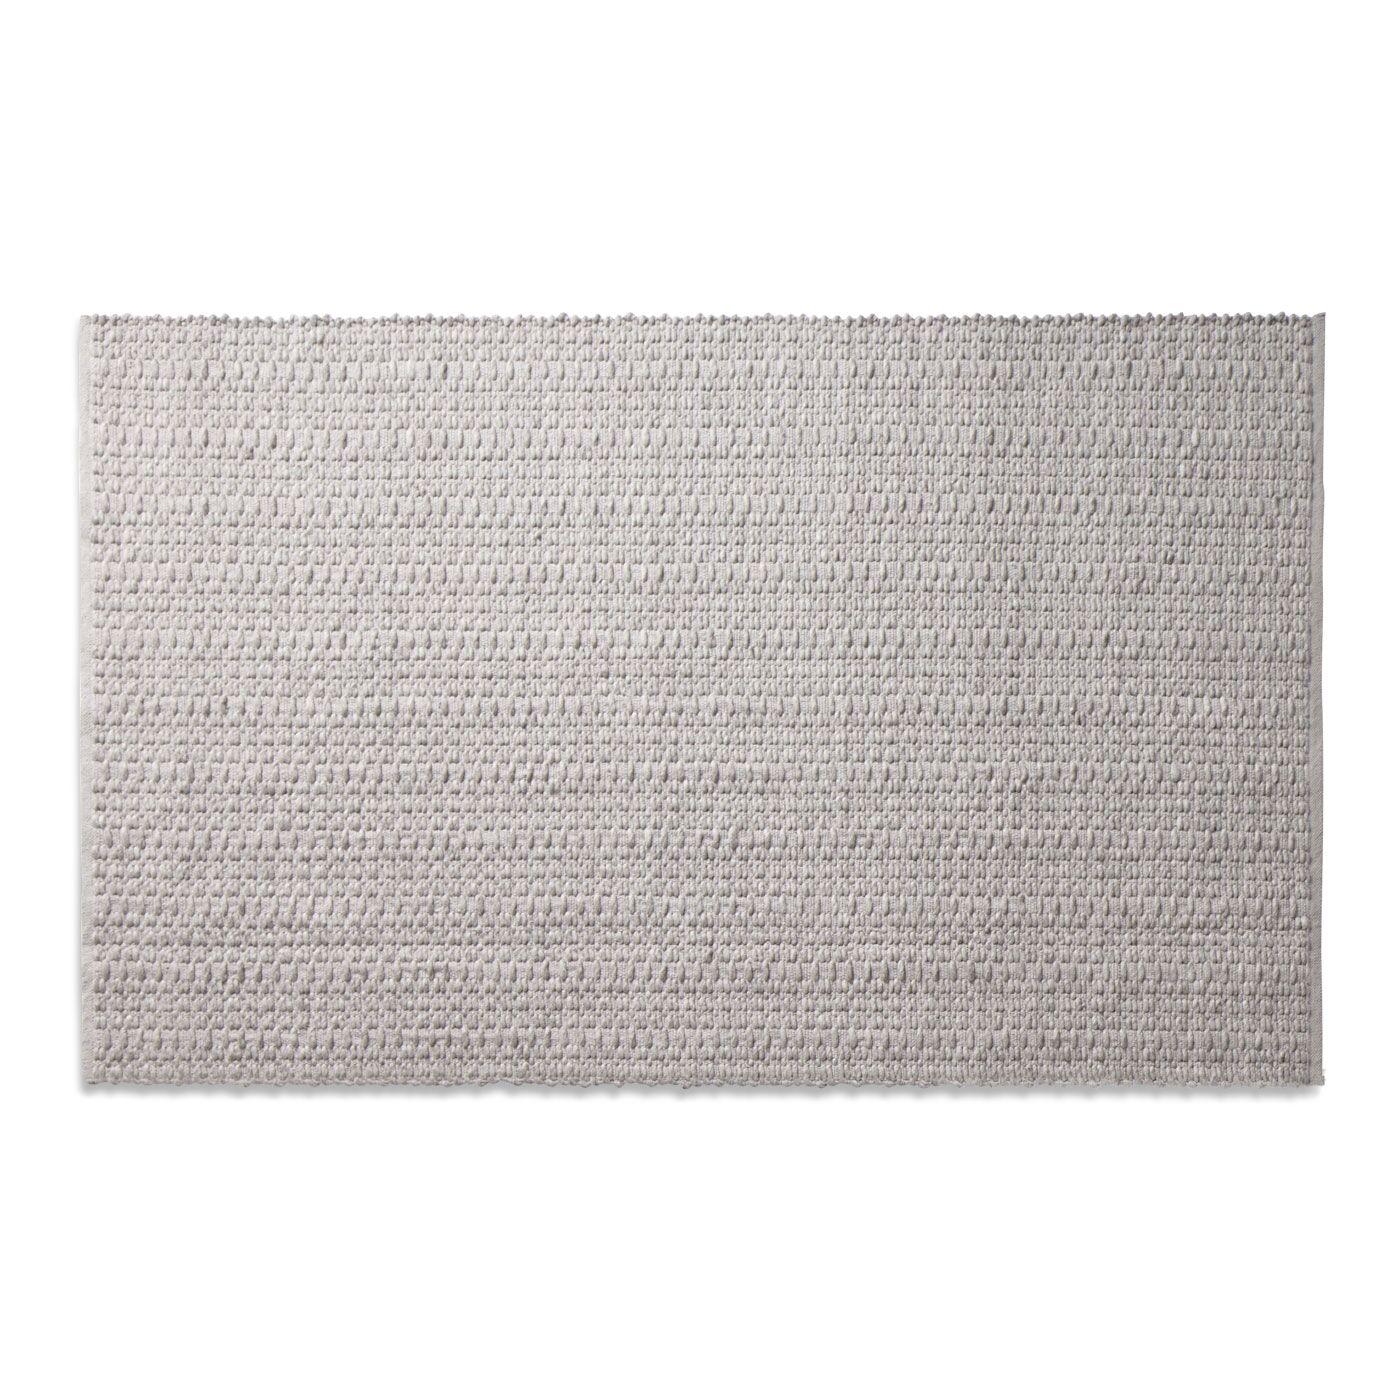 Weft Light Gray / Light Heathered Gray Area Rug Rug Size: 5' x 8'